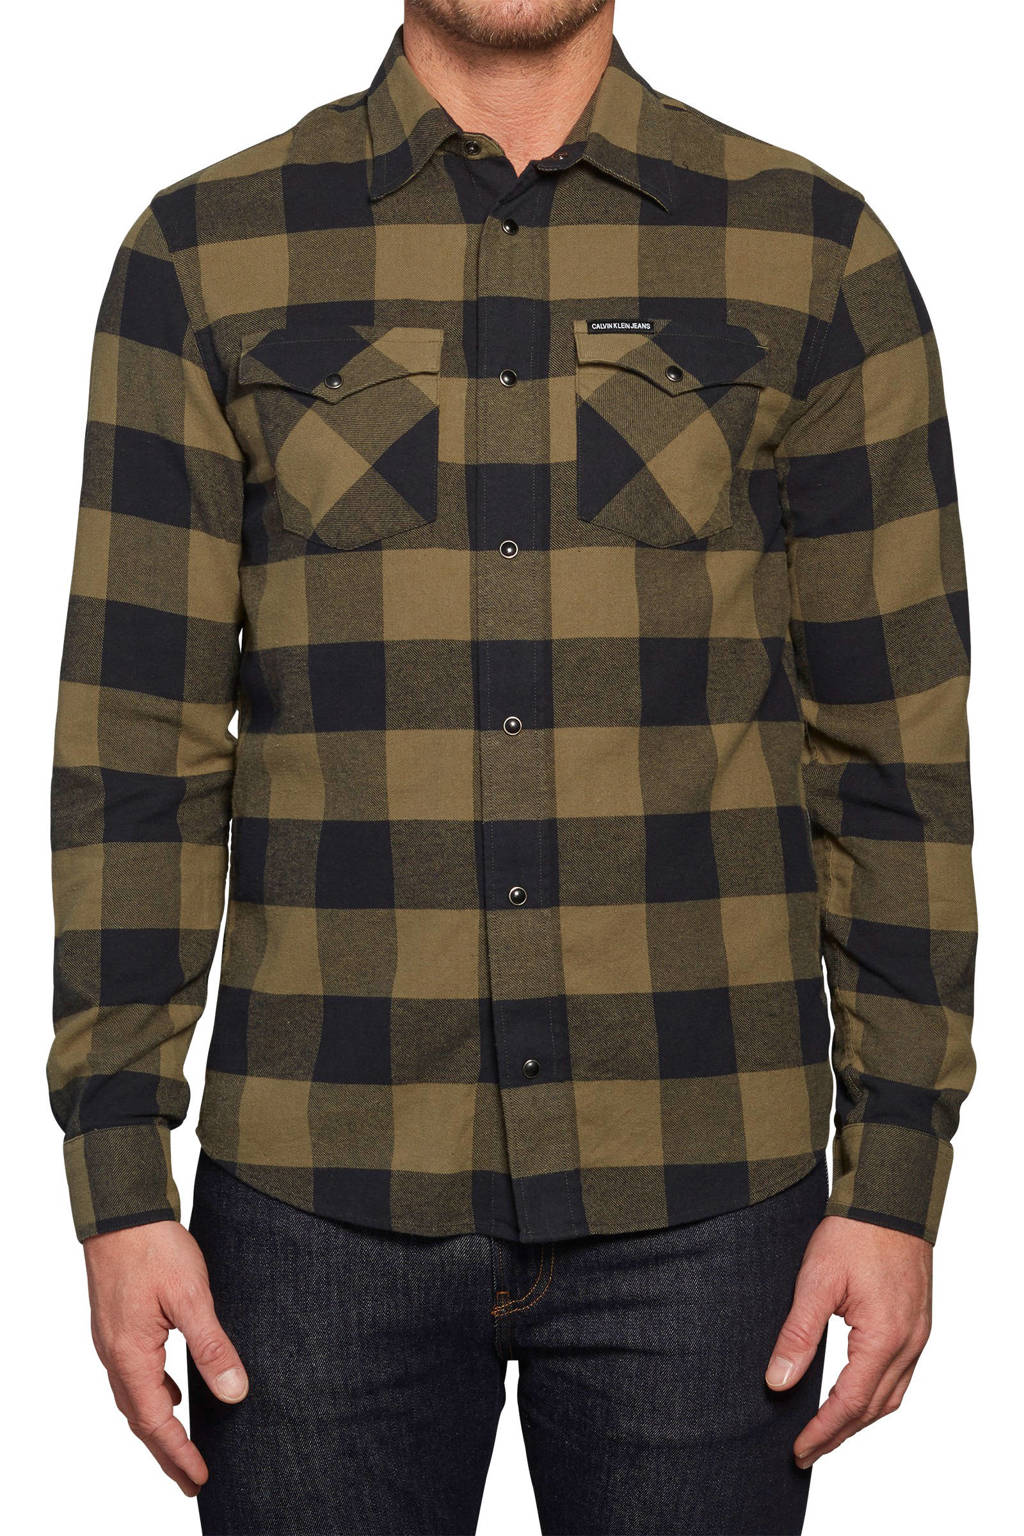 CALVIN KLEIN JEANS geruit slim fit overhemd bruin/zwart, Bruin/zwart